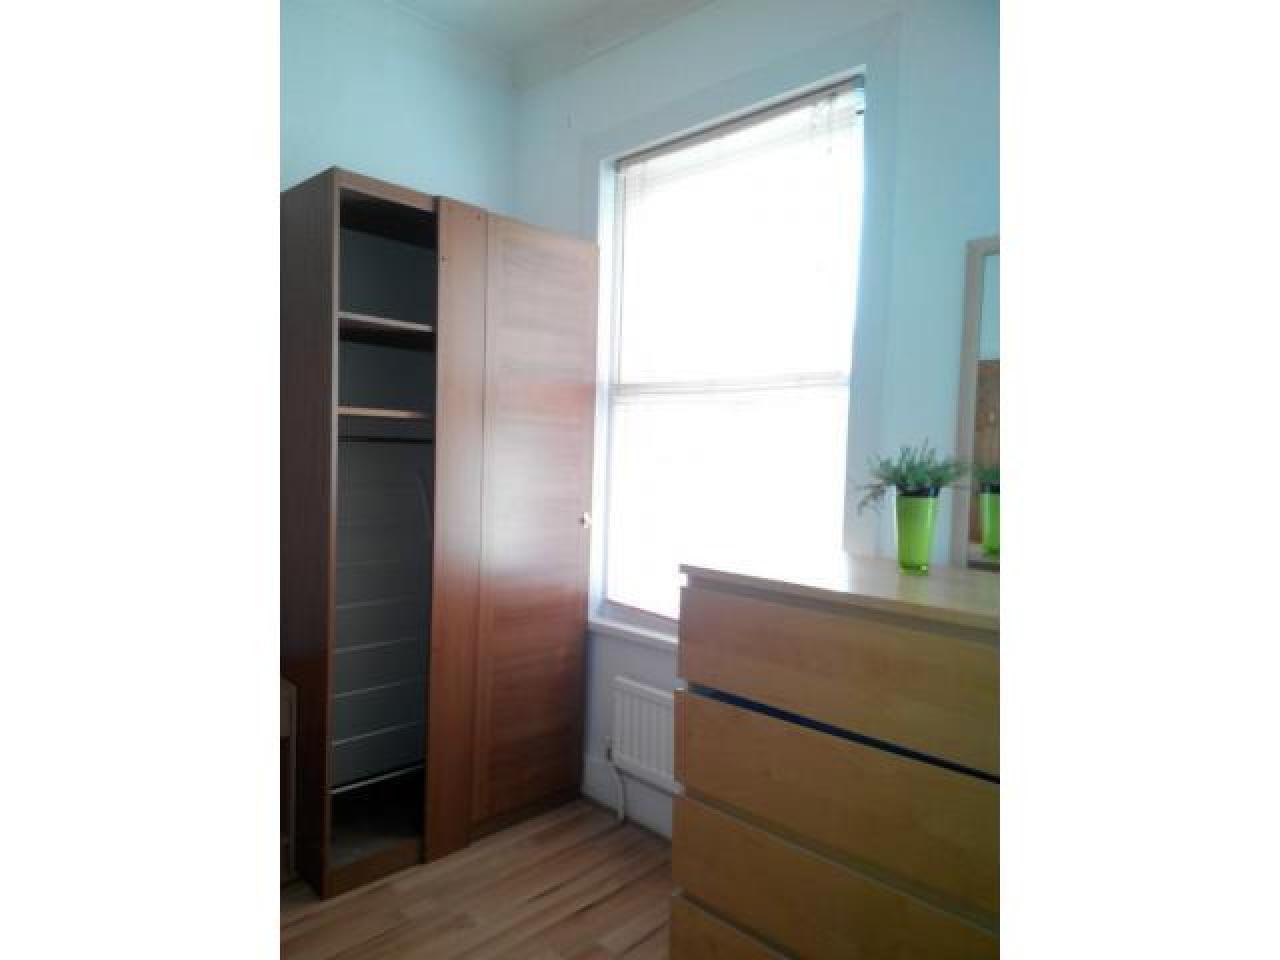 Двойная комната на Stratforde, зона 3, возле метро, все билы включени - 1